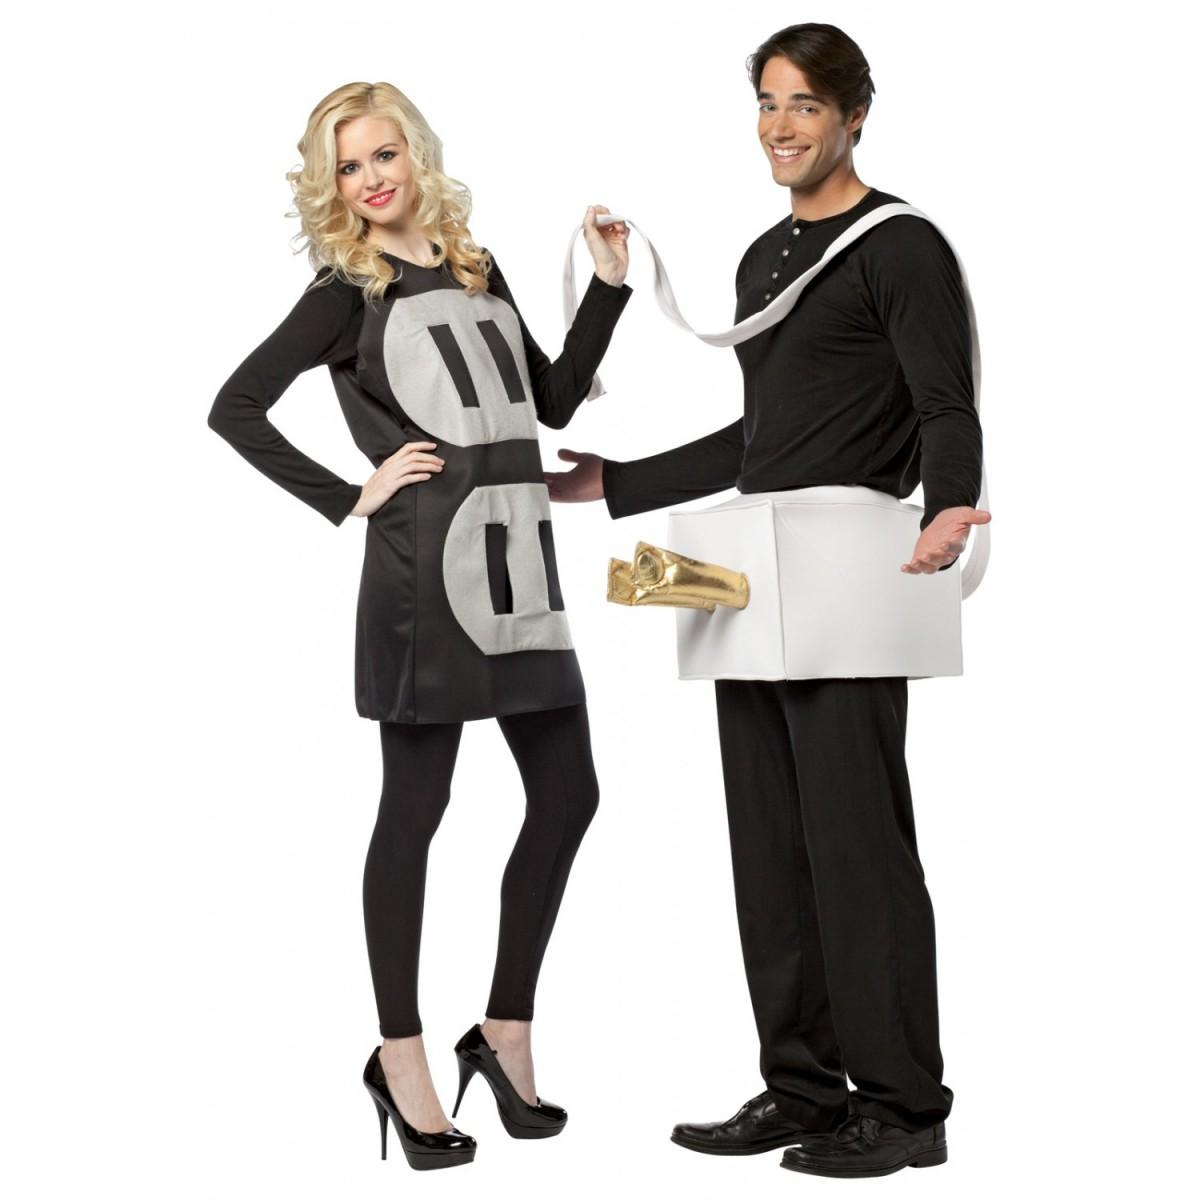 6 cute halloween costumes for couples 29secrets. Black Bedroom Furniture Sets. Home Design Ideas